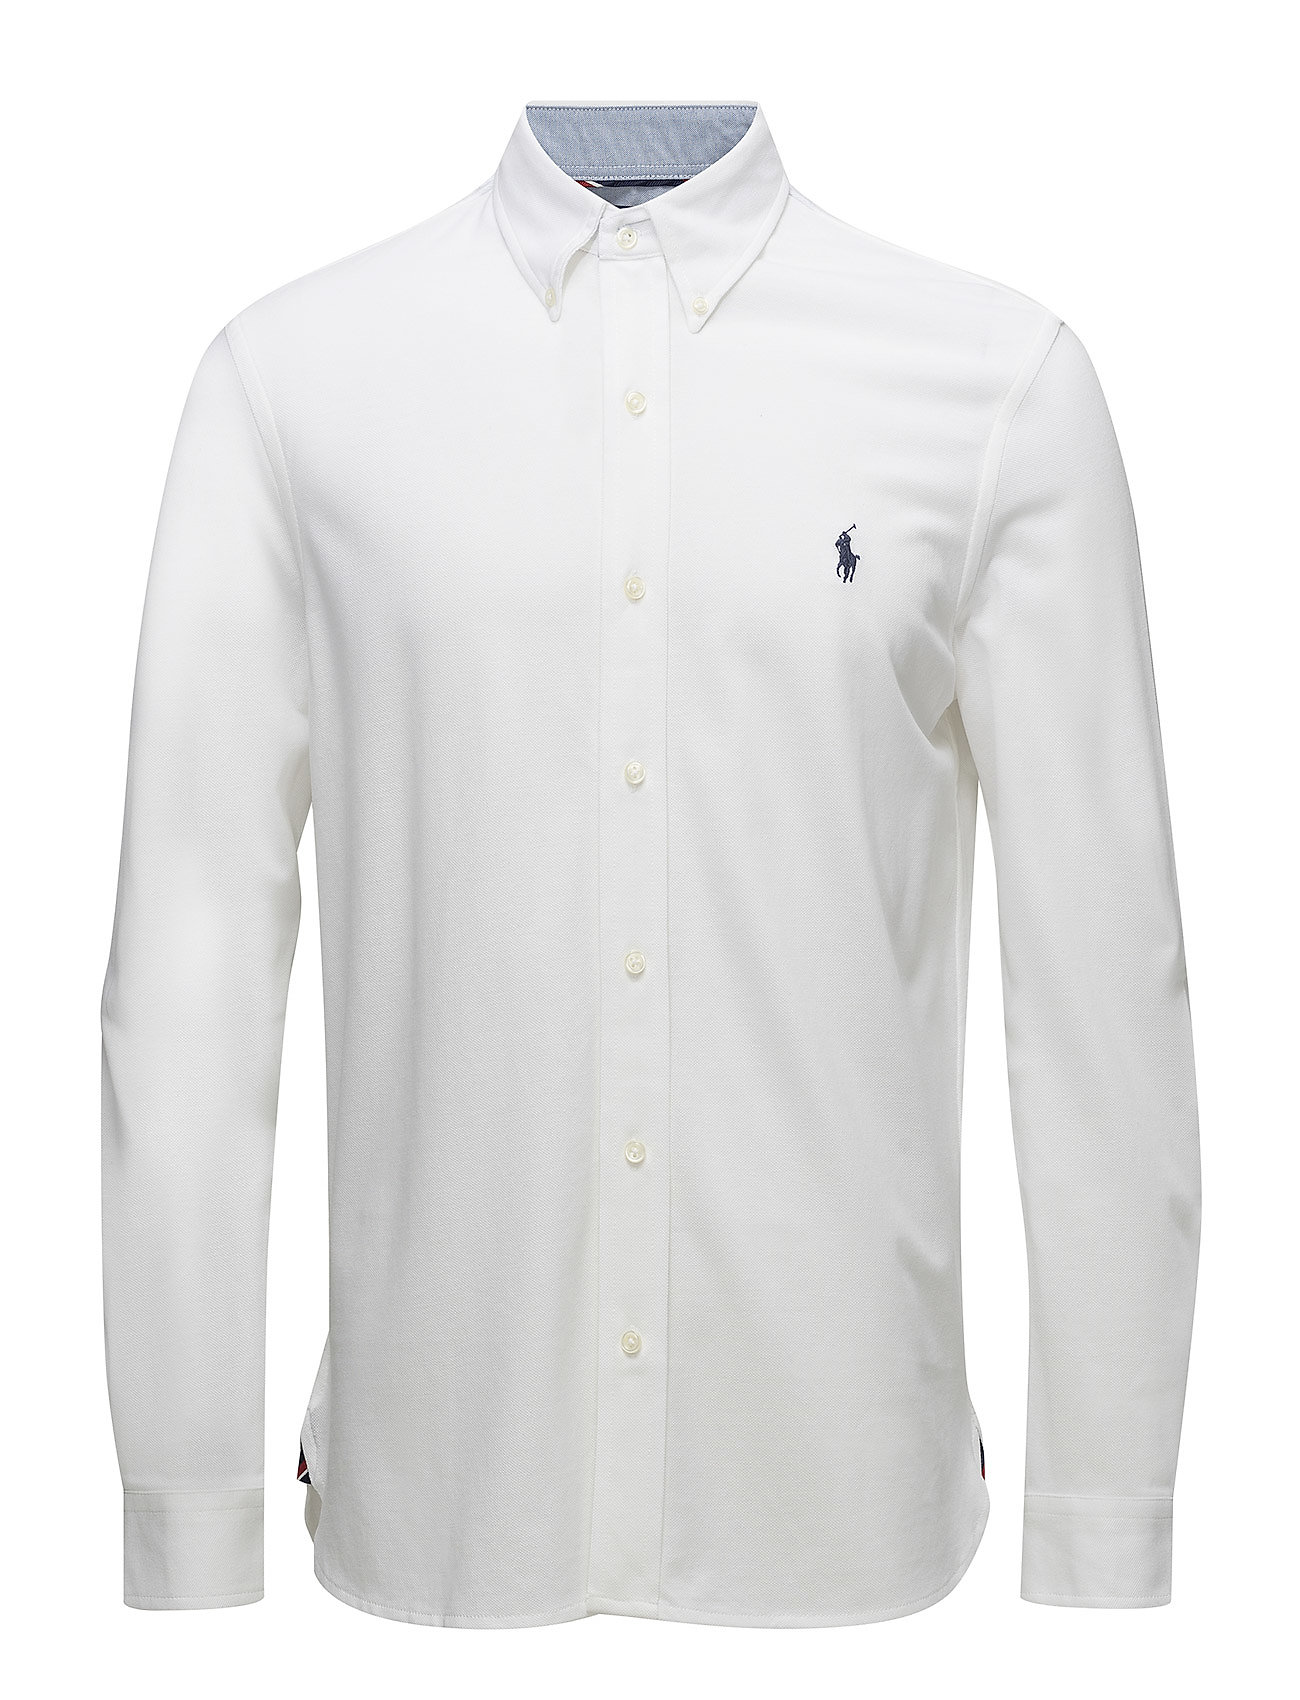 7b348f142b1 Featherweight Mesh Shirt (White) (65.40 €) - Polo Ralph Lauren ...